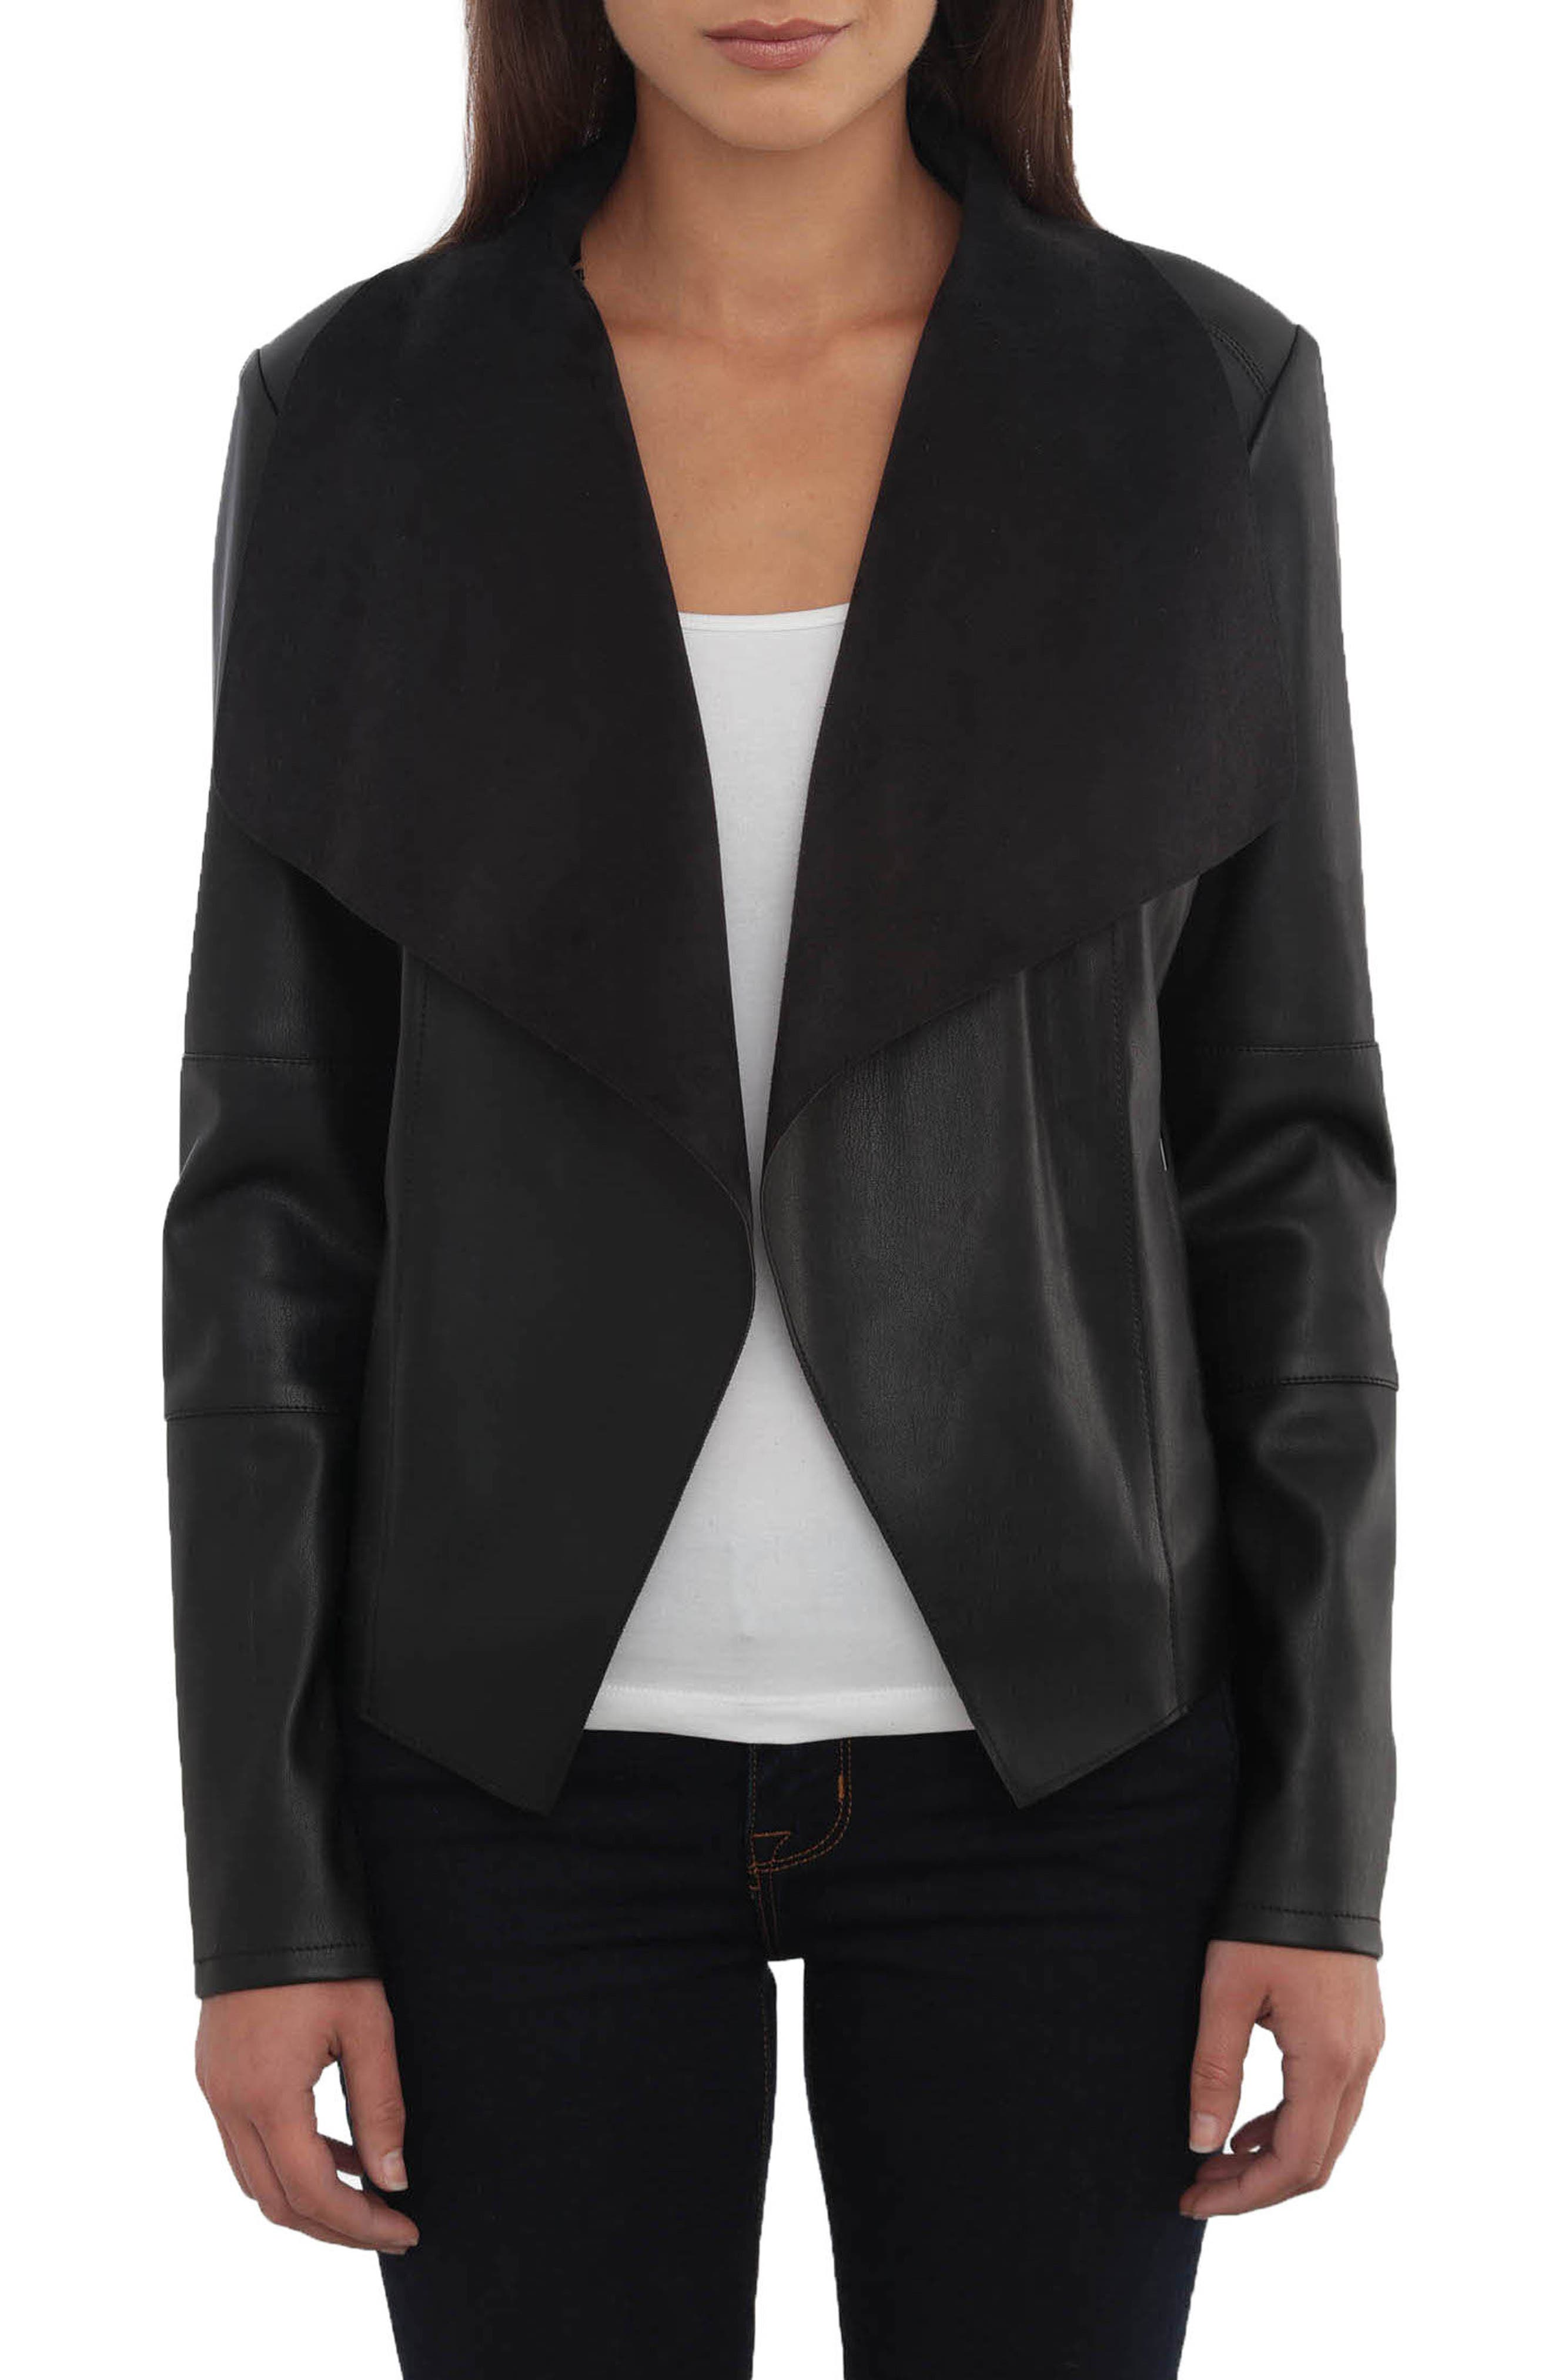 Drape Faux Leather & Faux Suede Jacket by Bagatelle